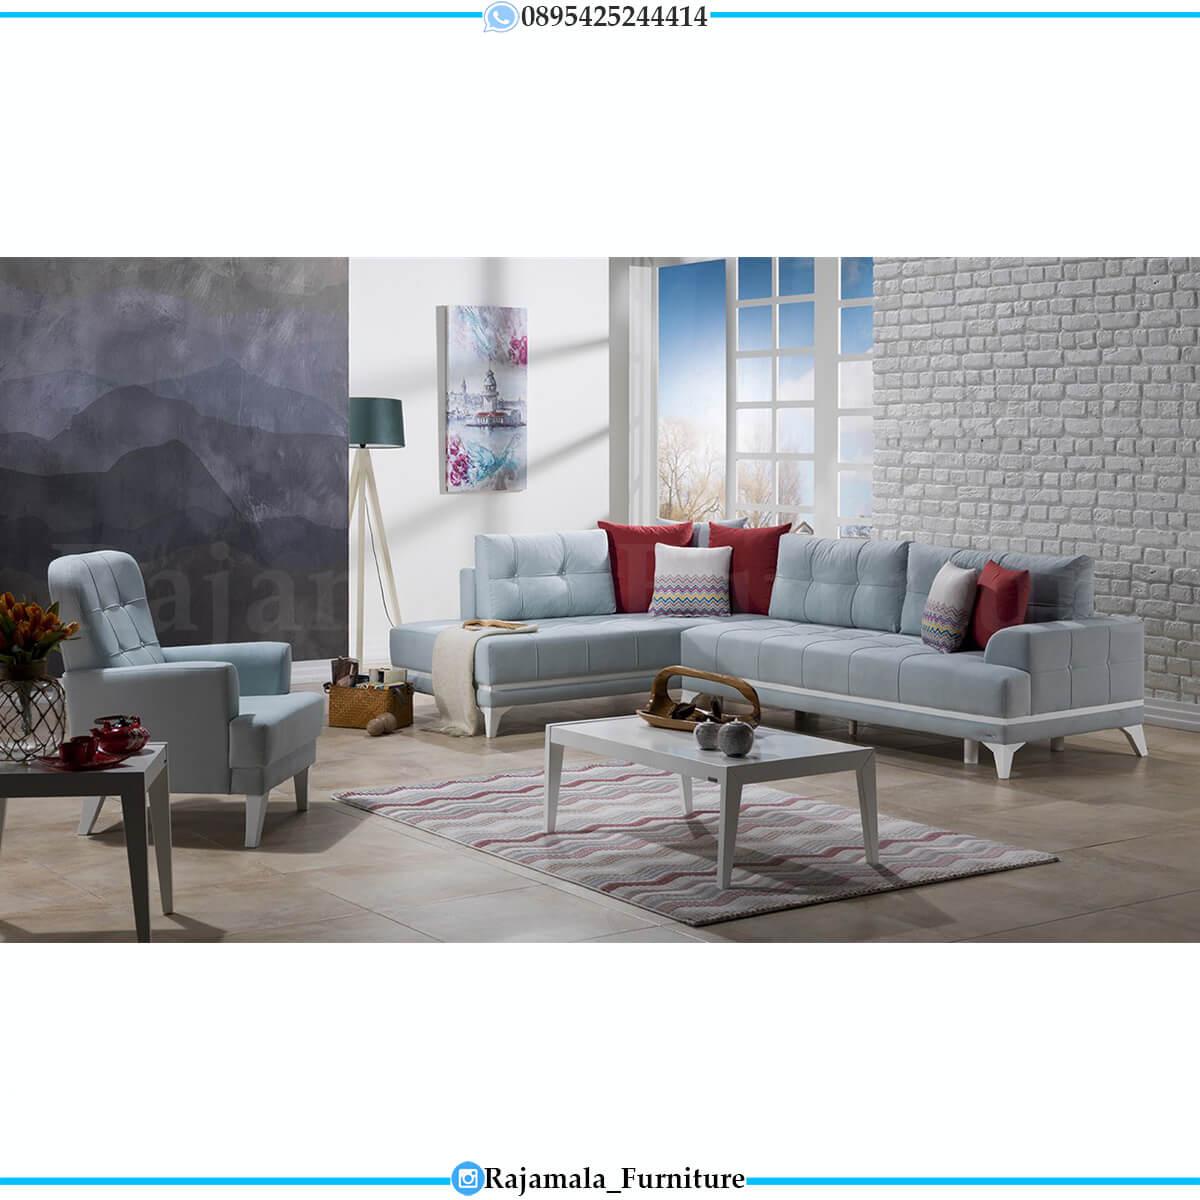 Best Seller Sofa Tamu Minimalis Terbaru White Duco Luxury Adorable Color RM-0629